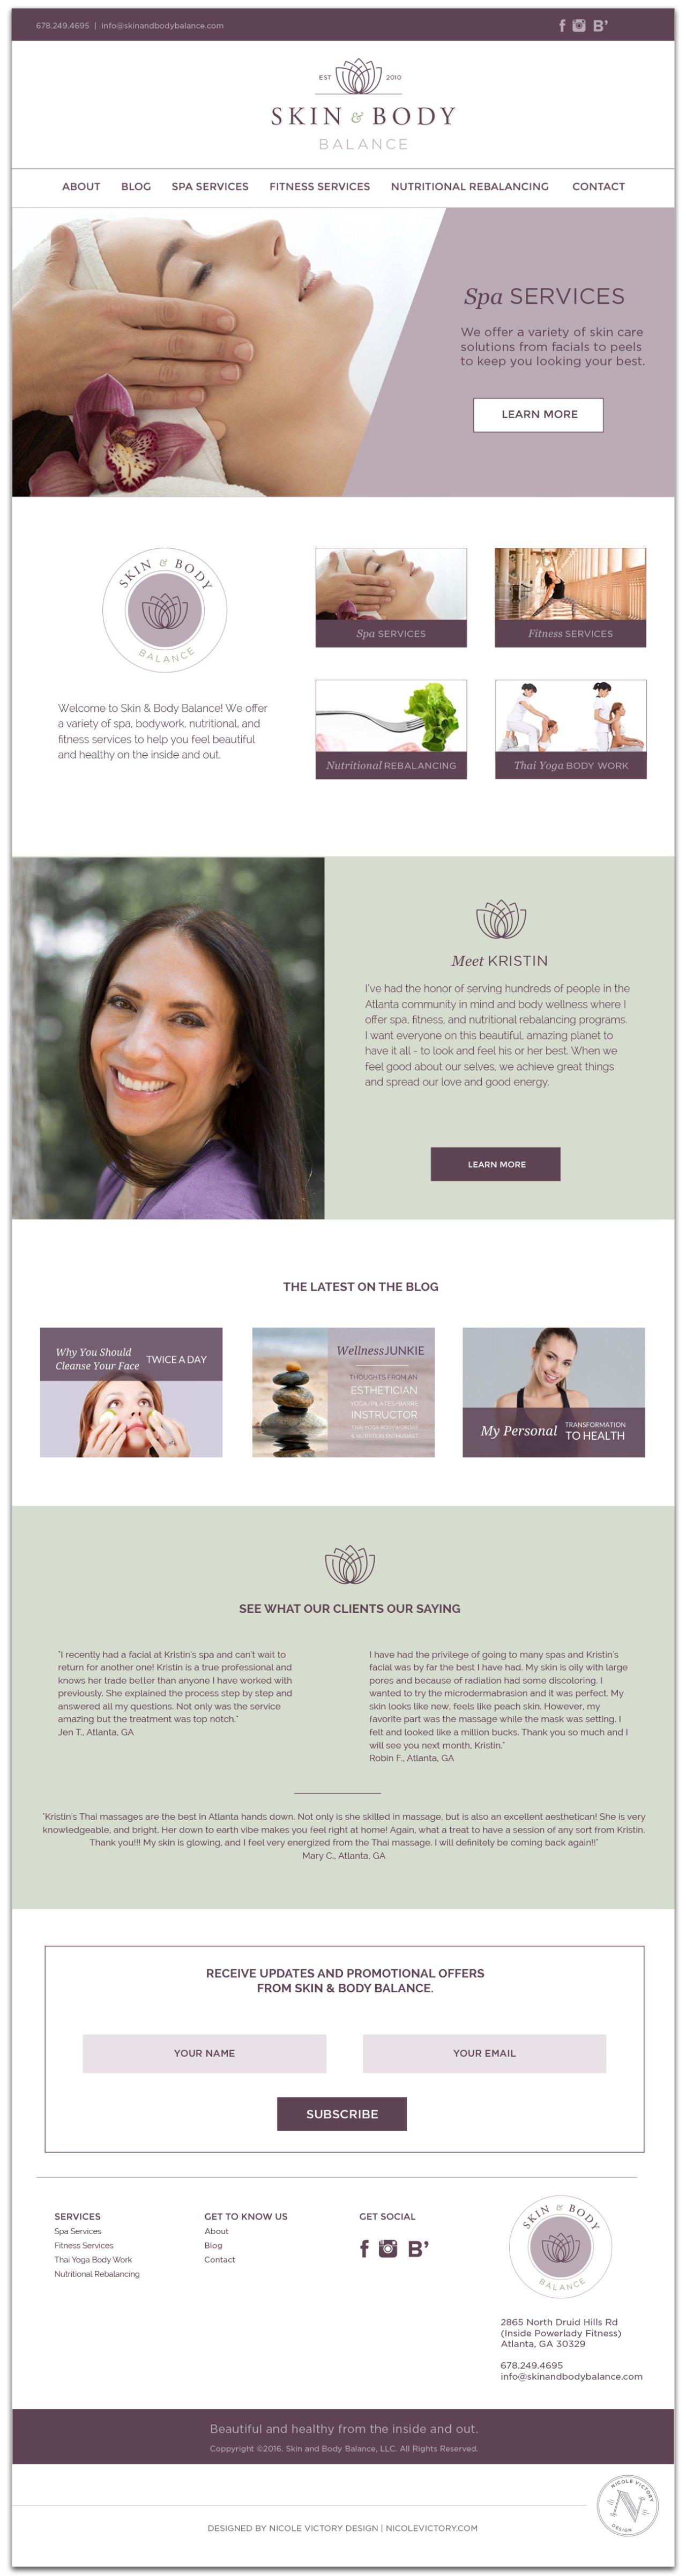 Skin and Body Balance Website Design | Nicole Victory Design